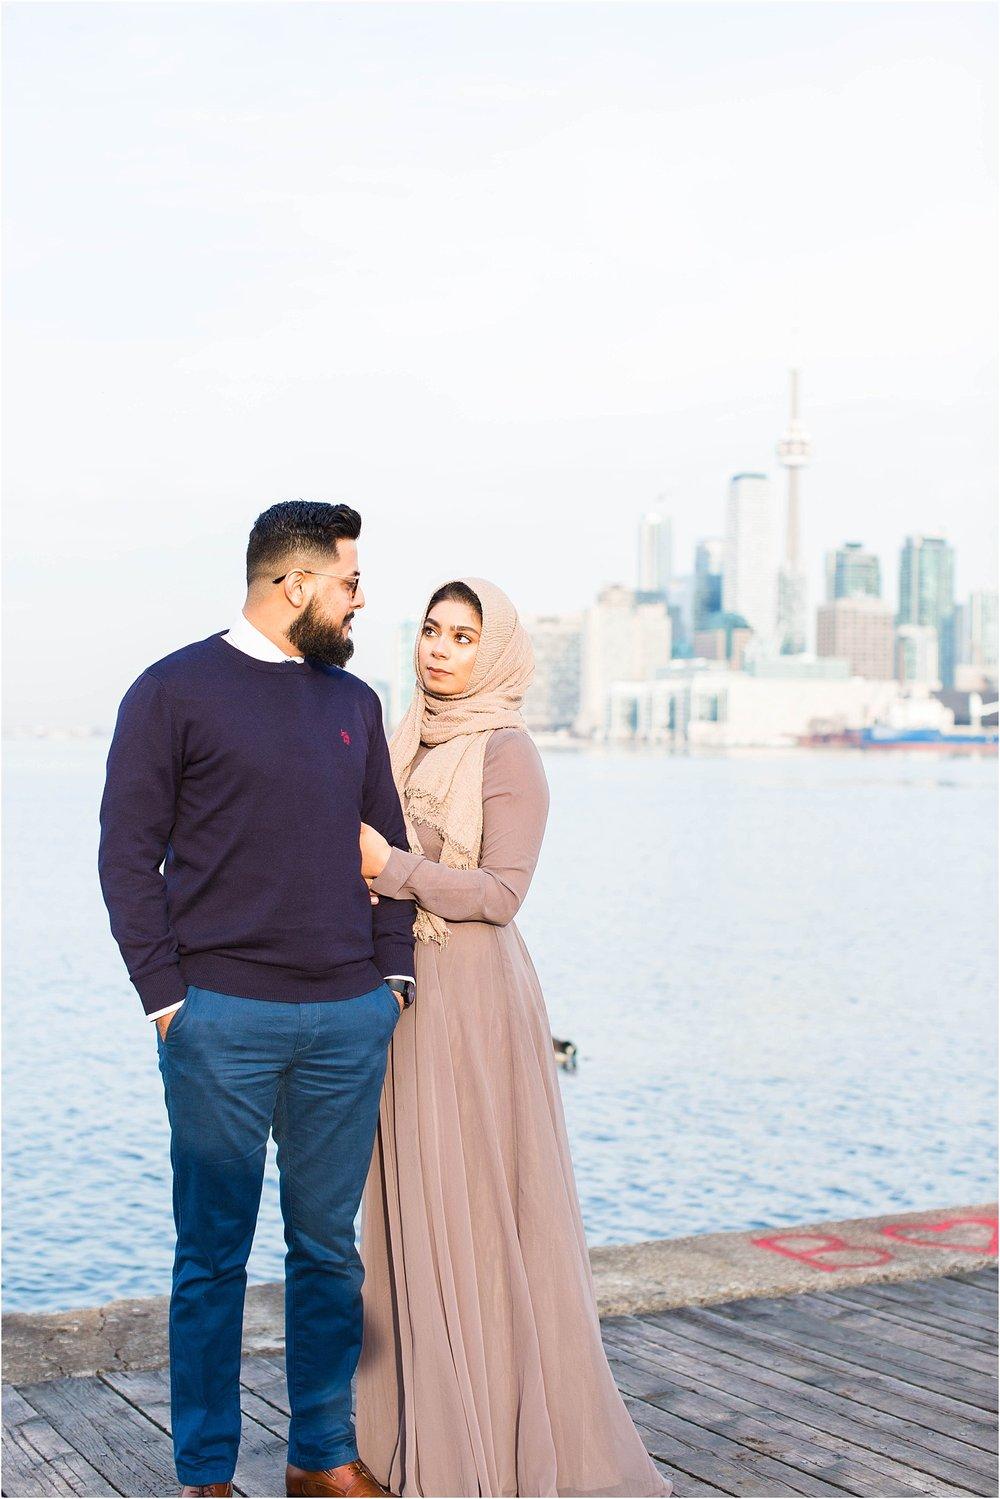 Polson-Pier-Distillery-District-Engagement-Session-Toronto-Mississauga-Brampton-Scarborough-GTA-Pakistani-Indian-Wedding-Engagement-Photographer-Photography_0001.jpg